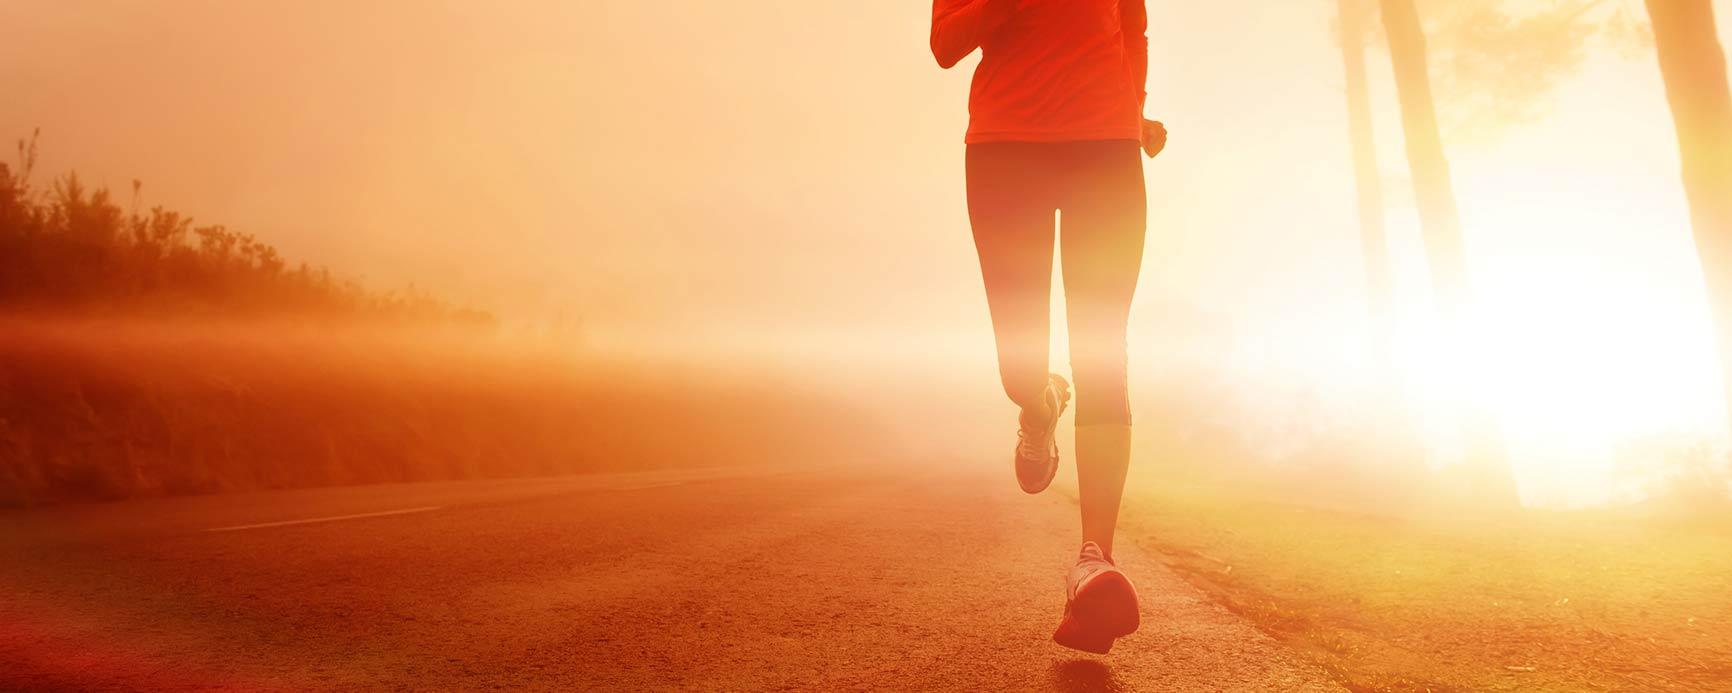 background-image-runners-sun